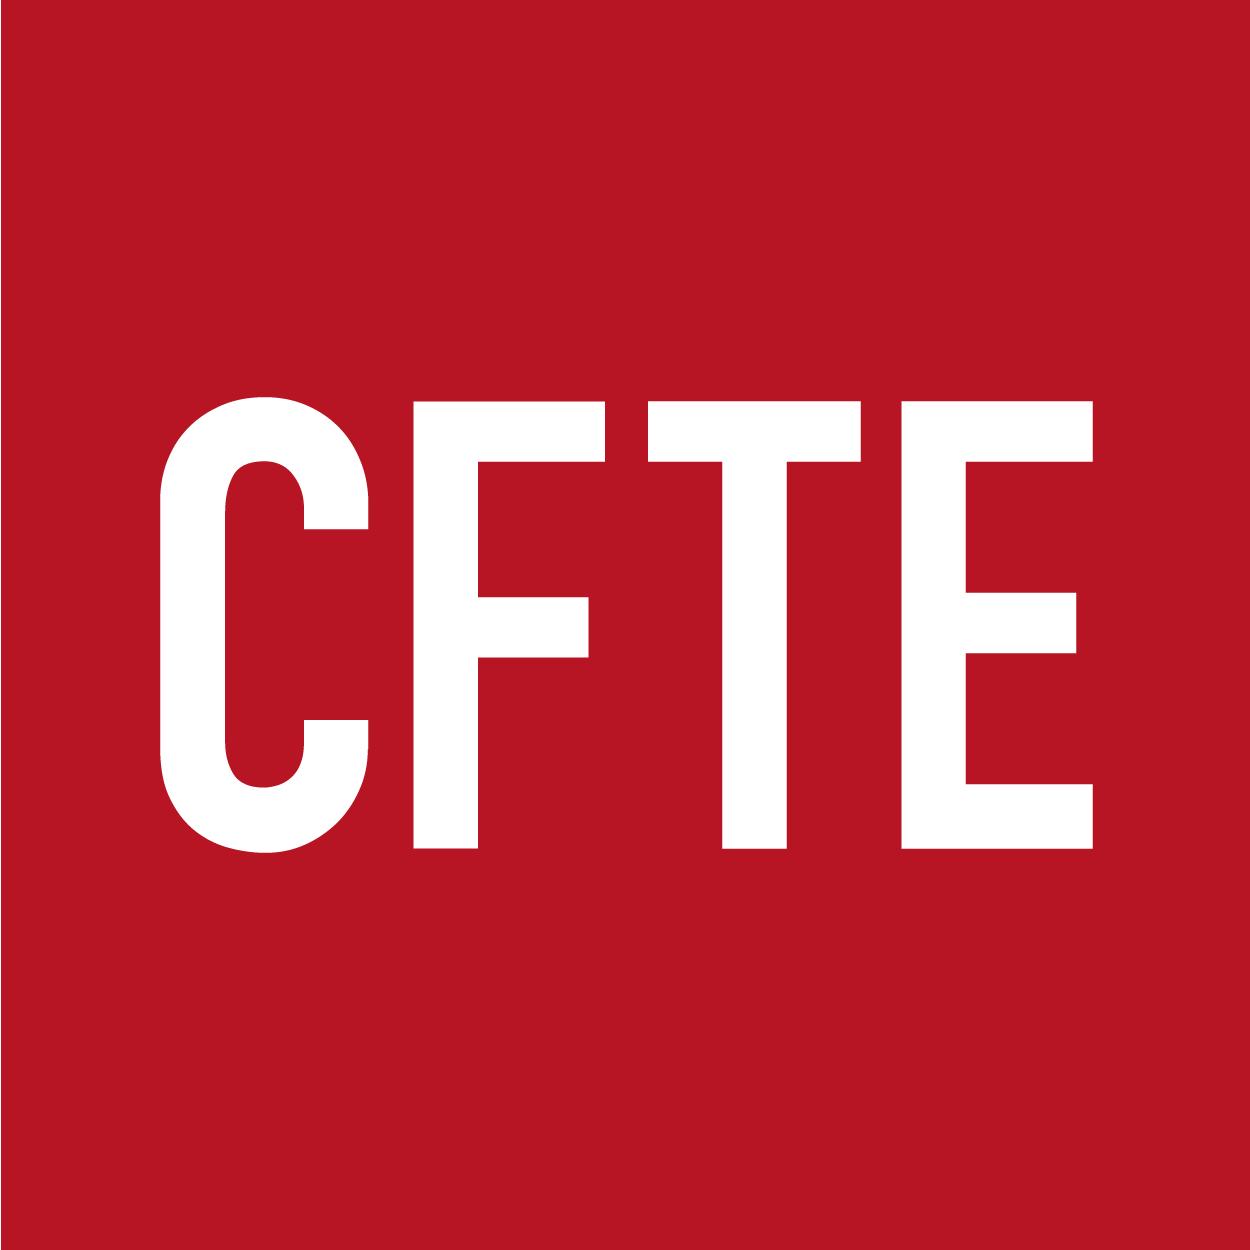 CFTE Corporate